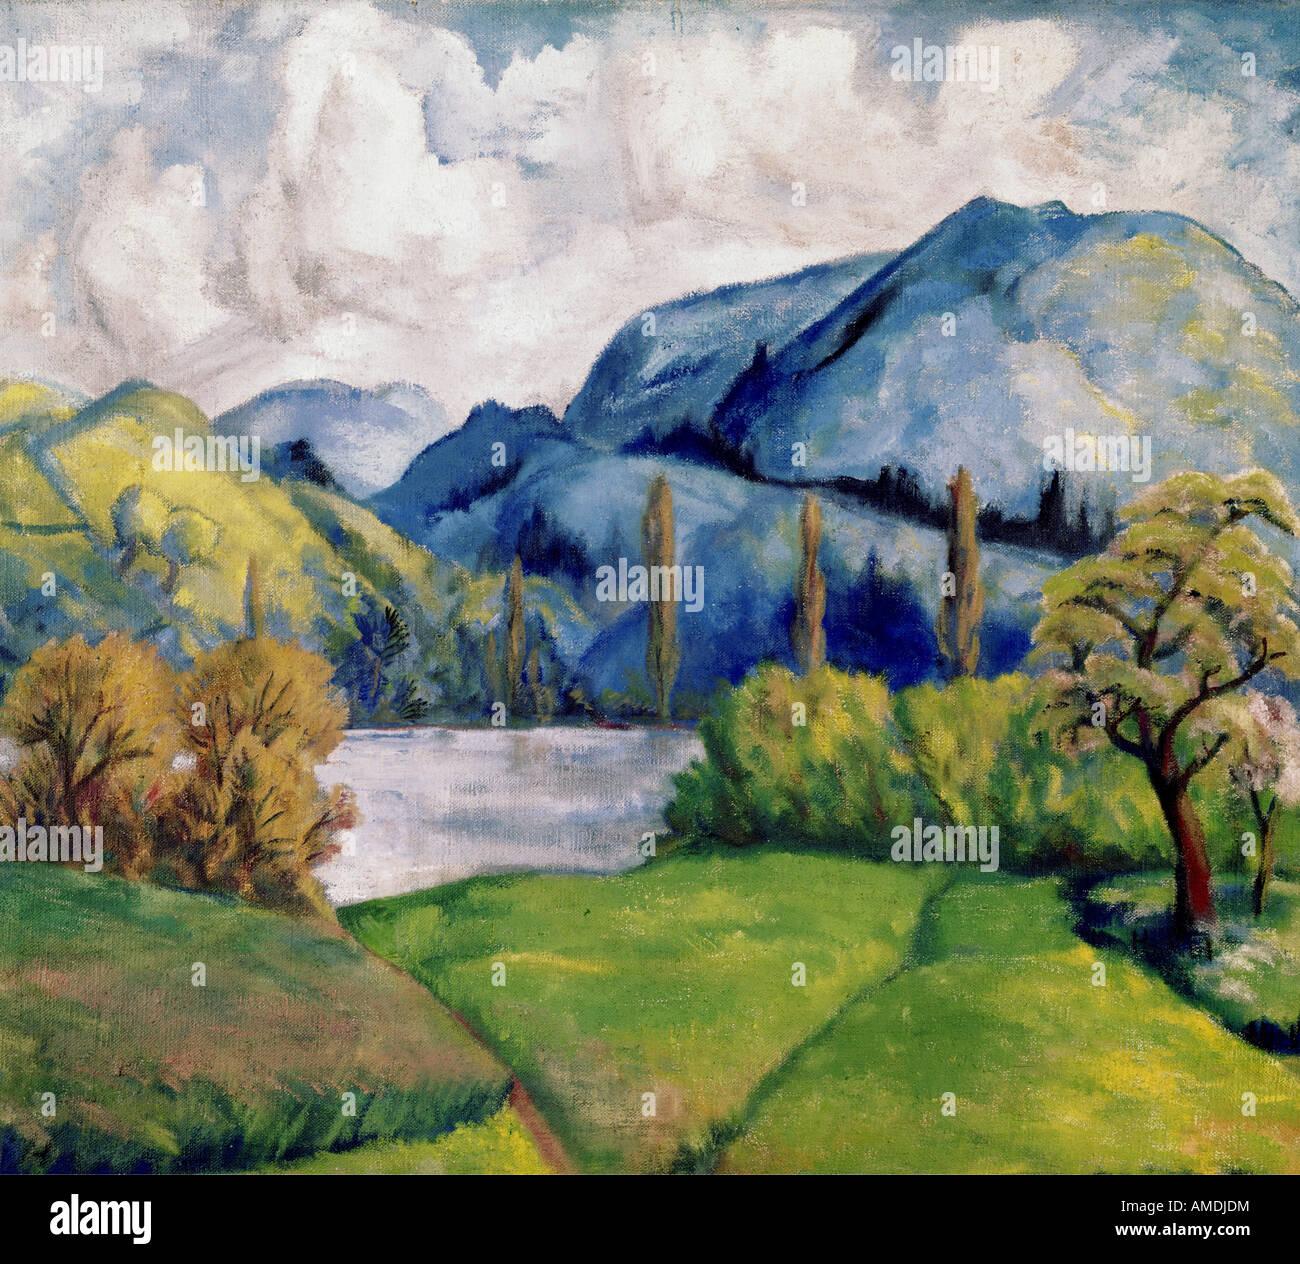 Bellas artes, Cezanne, Paul (1839 - 1906), la pintura, la Kunsthaus Zürich, Francés, impressionsm, naturaleza, árboles, Foto de stock